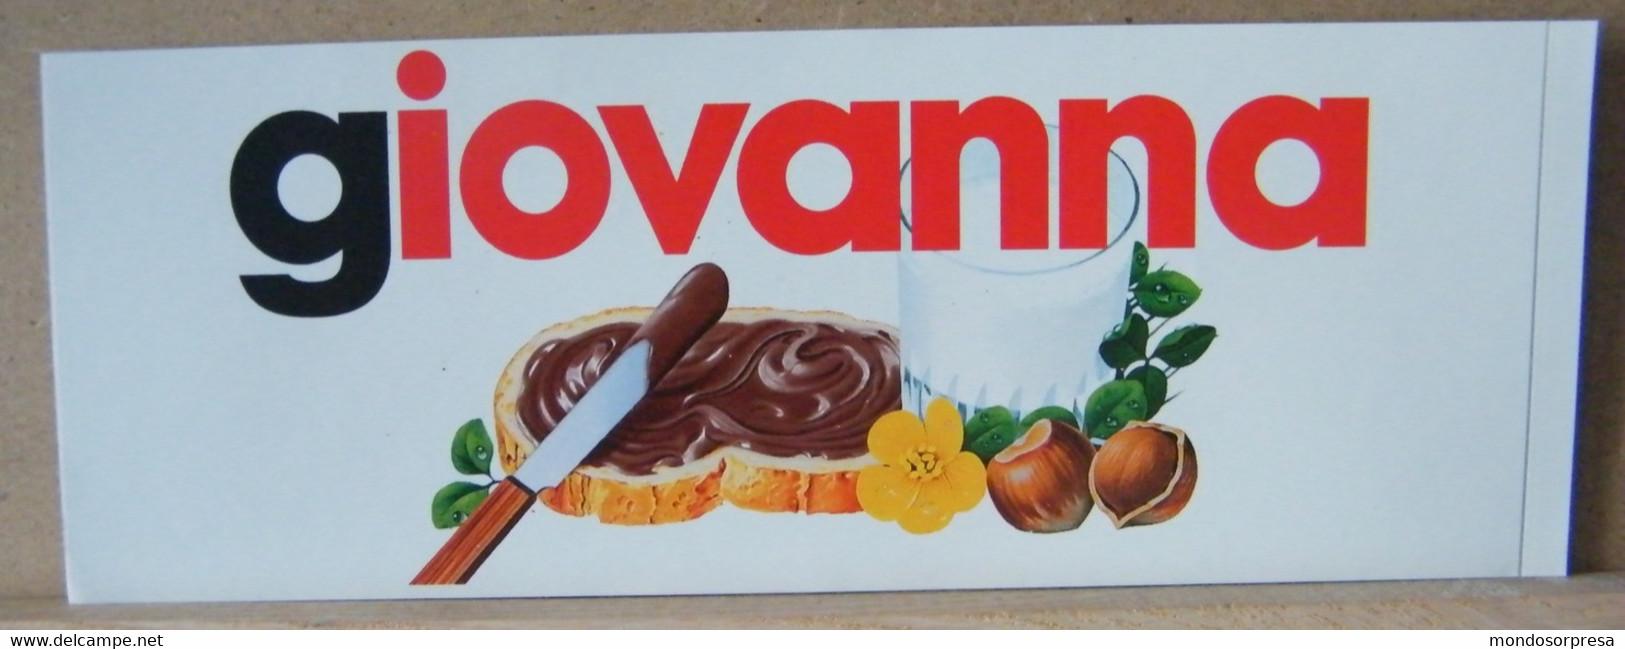 MONDOSORPRESA, ADESIVI NUTELLA NOMI, GIOVANNA - Nutella